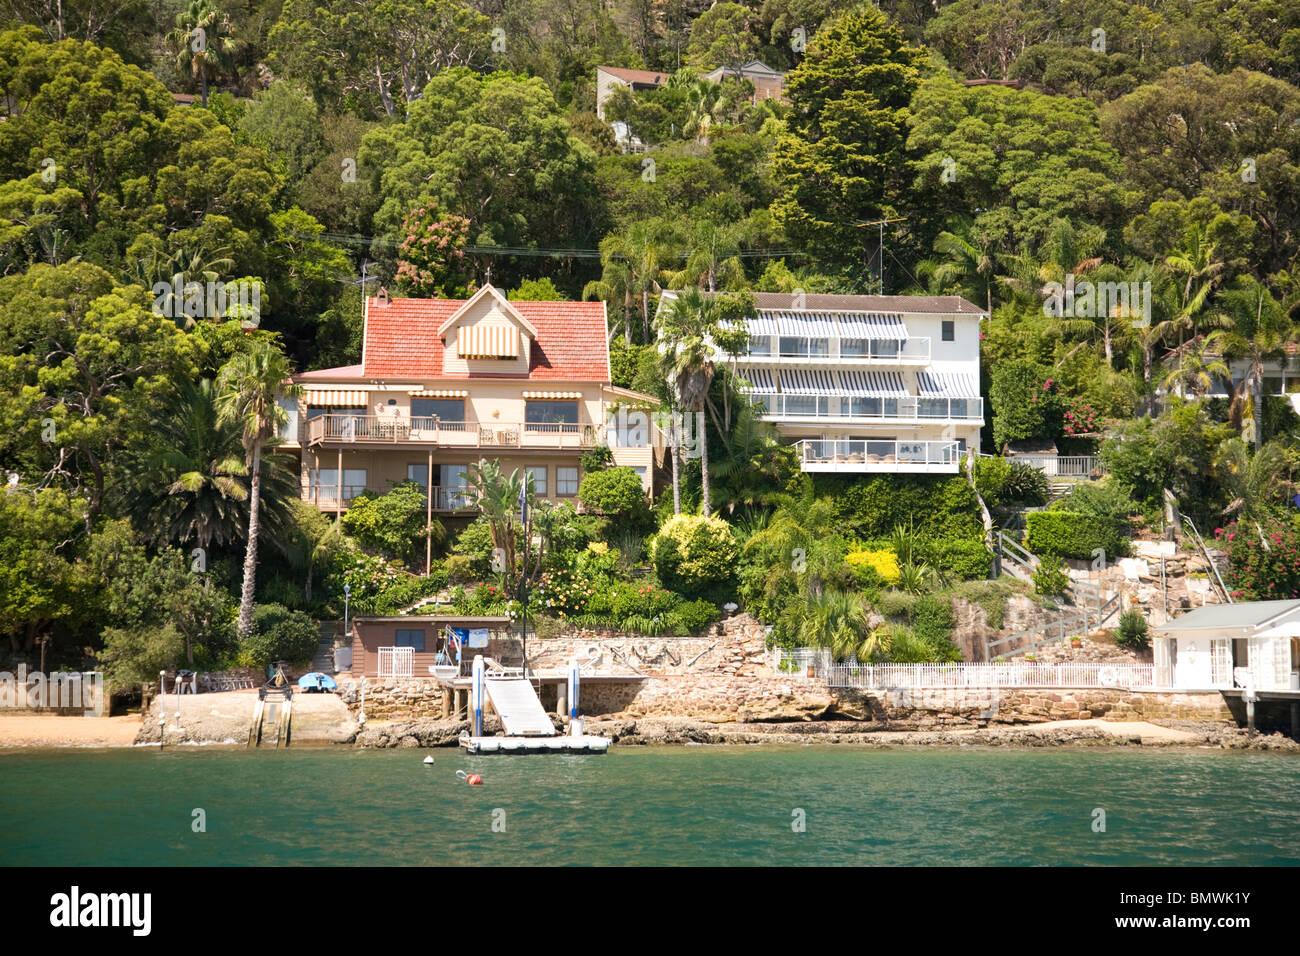 Luxury waterfront homes at palm beach sydney australia stock image